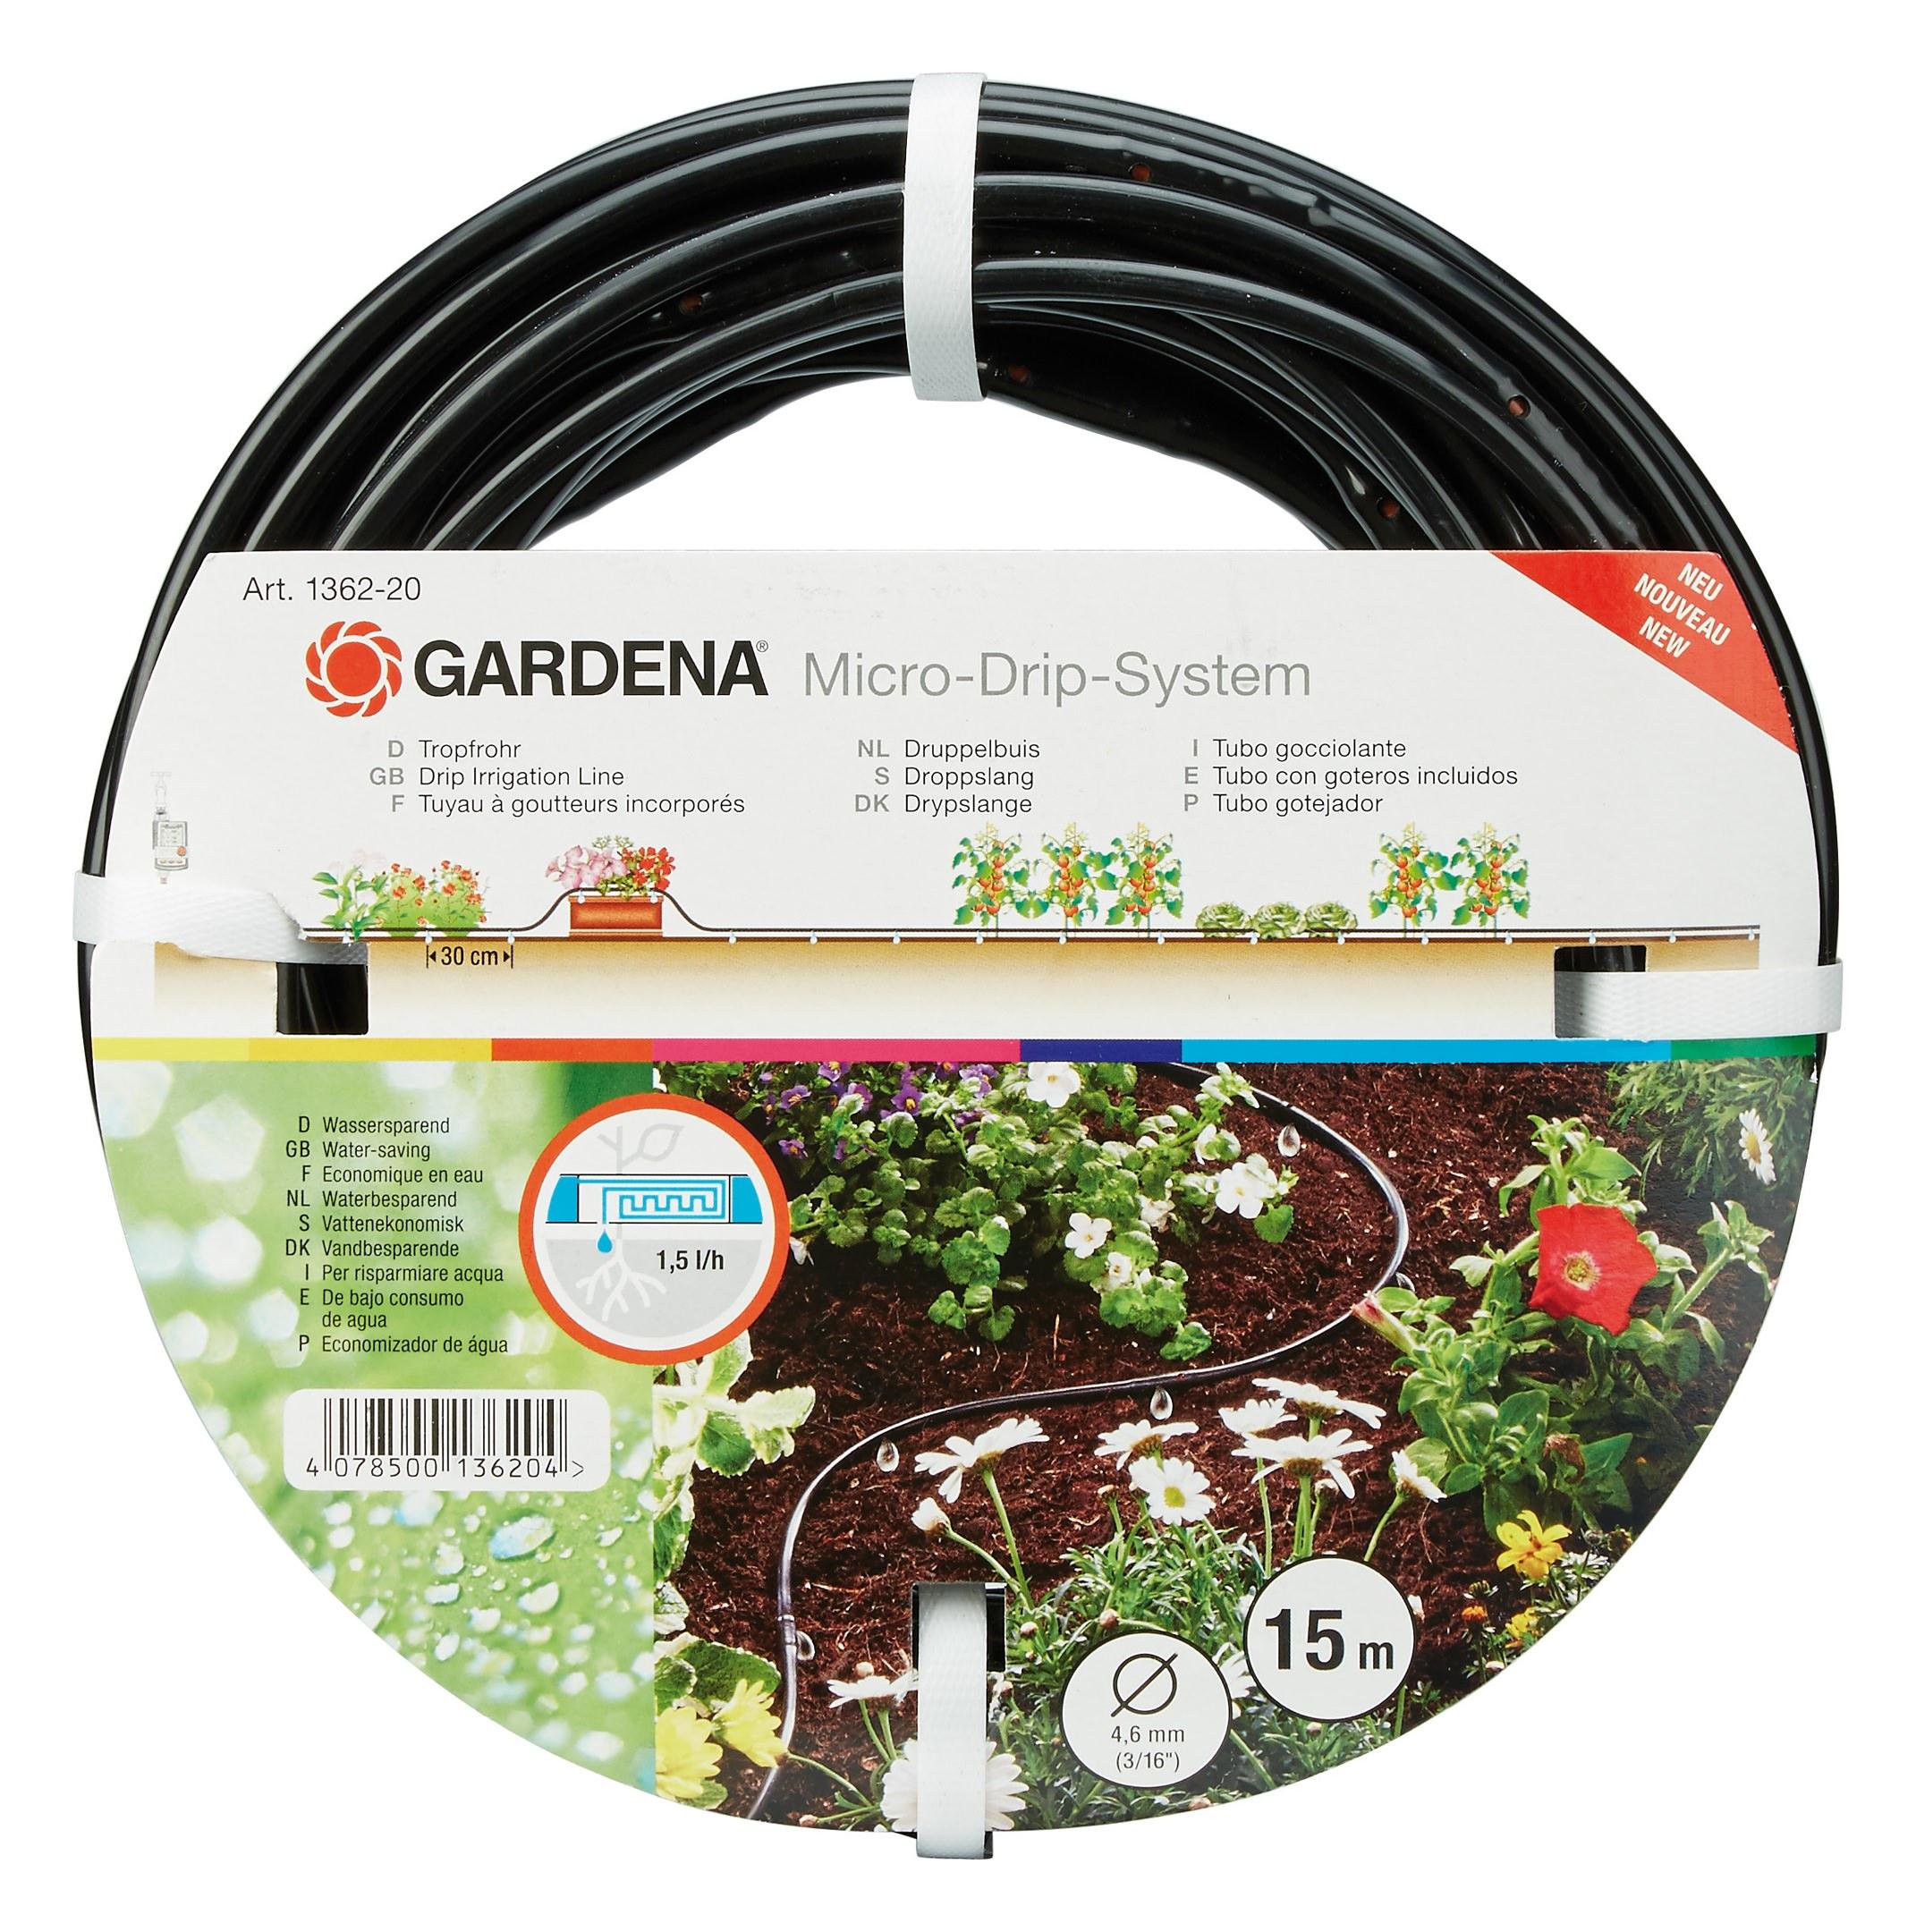 gardena tropfrohr oberirdisch 4 6 mm 3 16 15 m 1362 01362 20. Black Bedroom Furniture Sets. Home Design Ideas